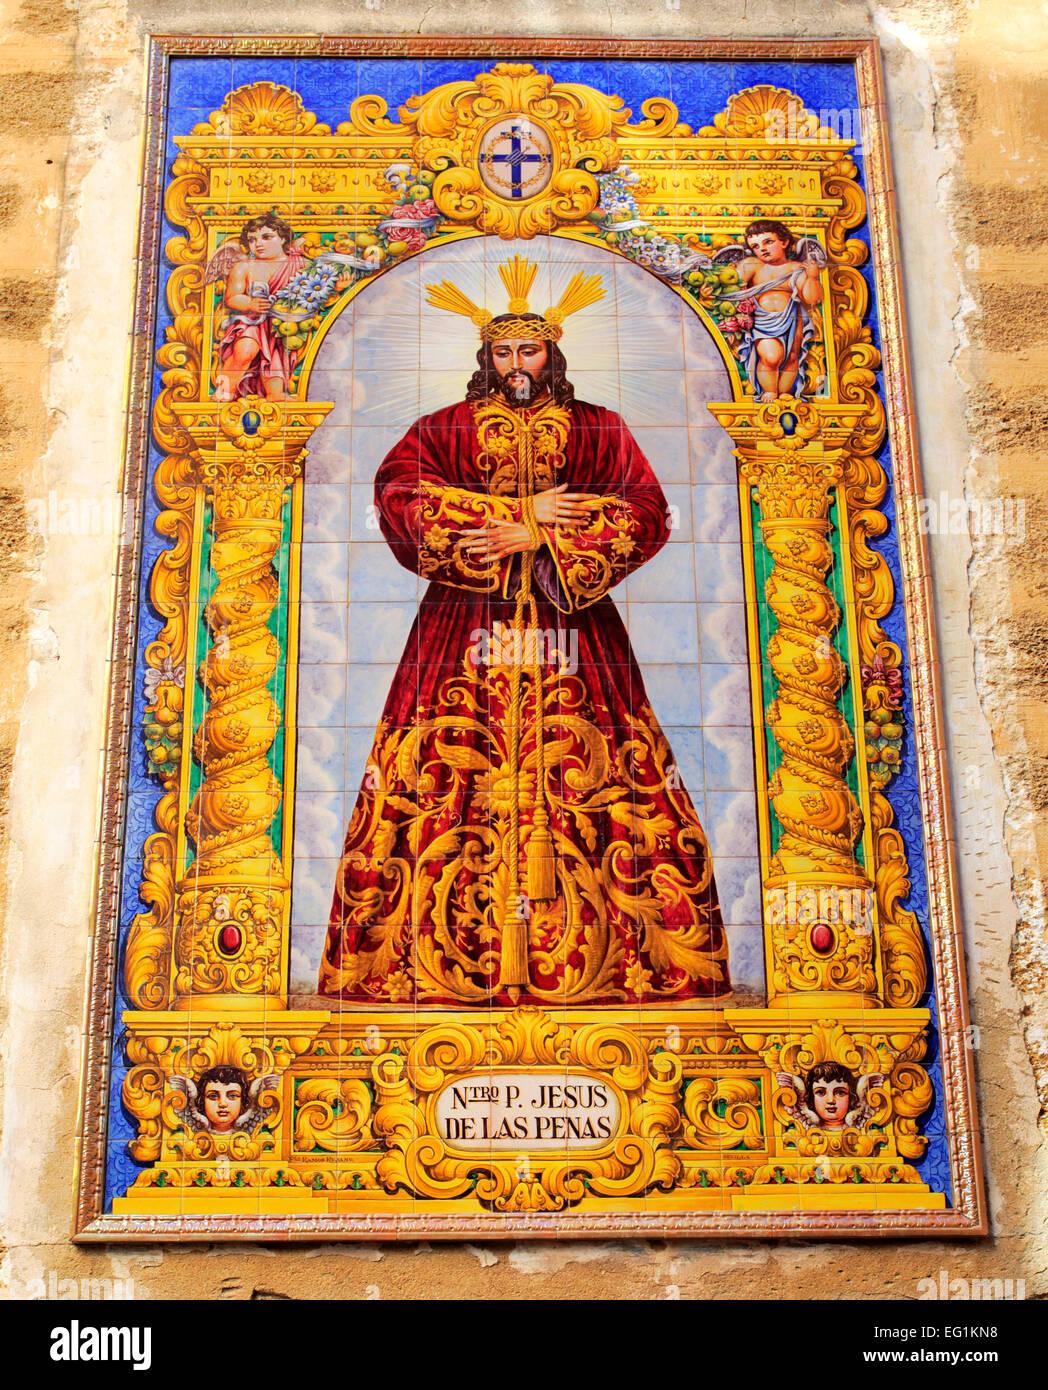 Retablo stock photos retablo stock images alamy for Azulejos cadiz